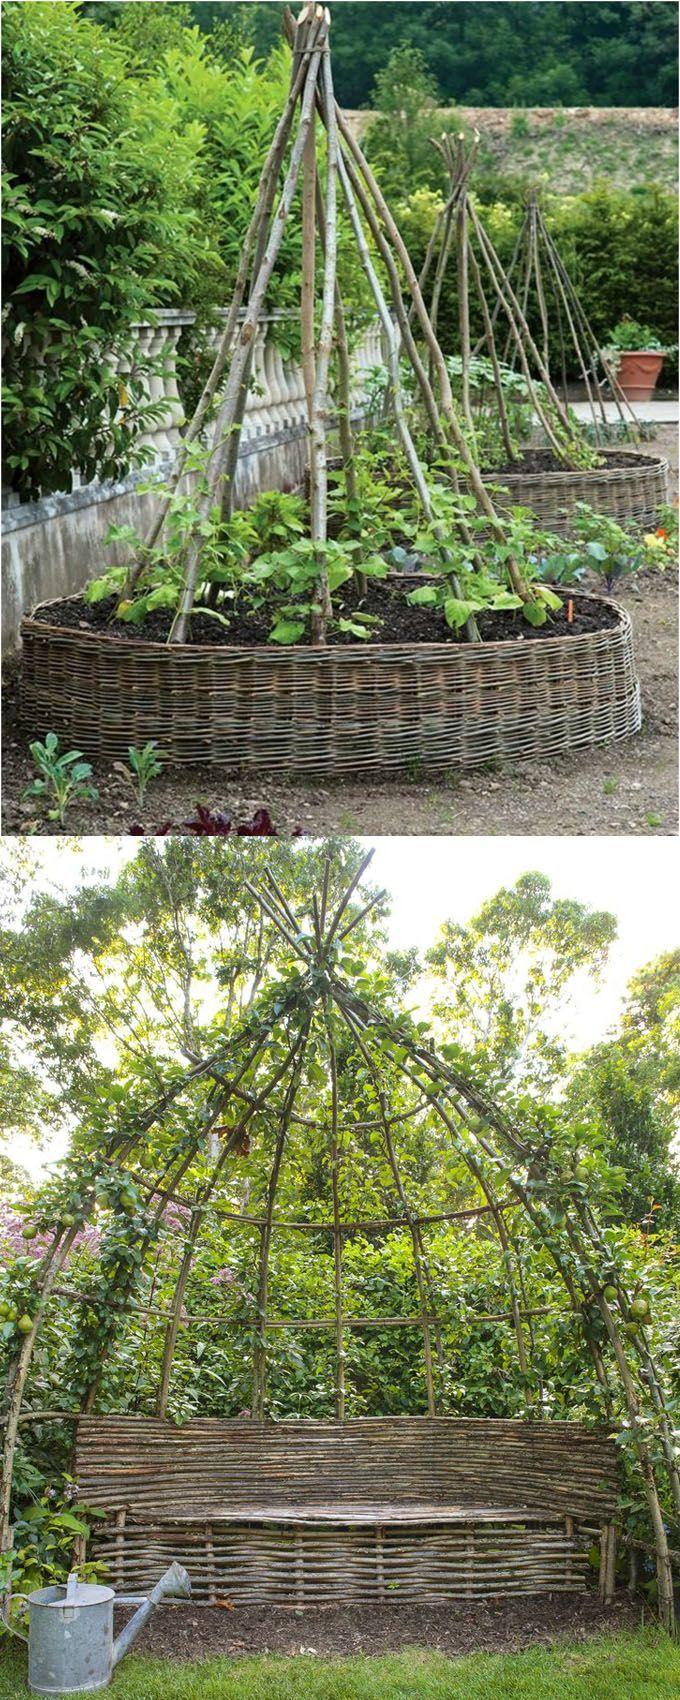 24 Easy DIY Garden Trellis Ideas & Plant Structures - A Piece of Rainbow